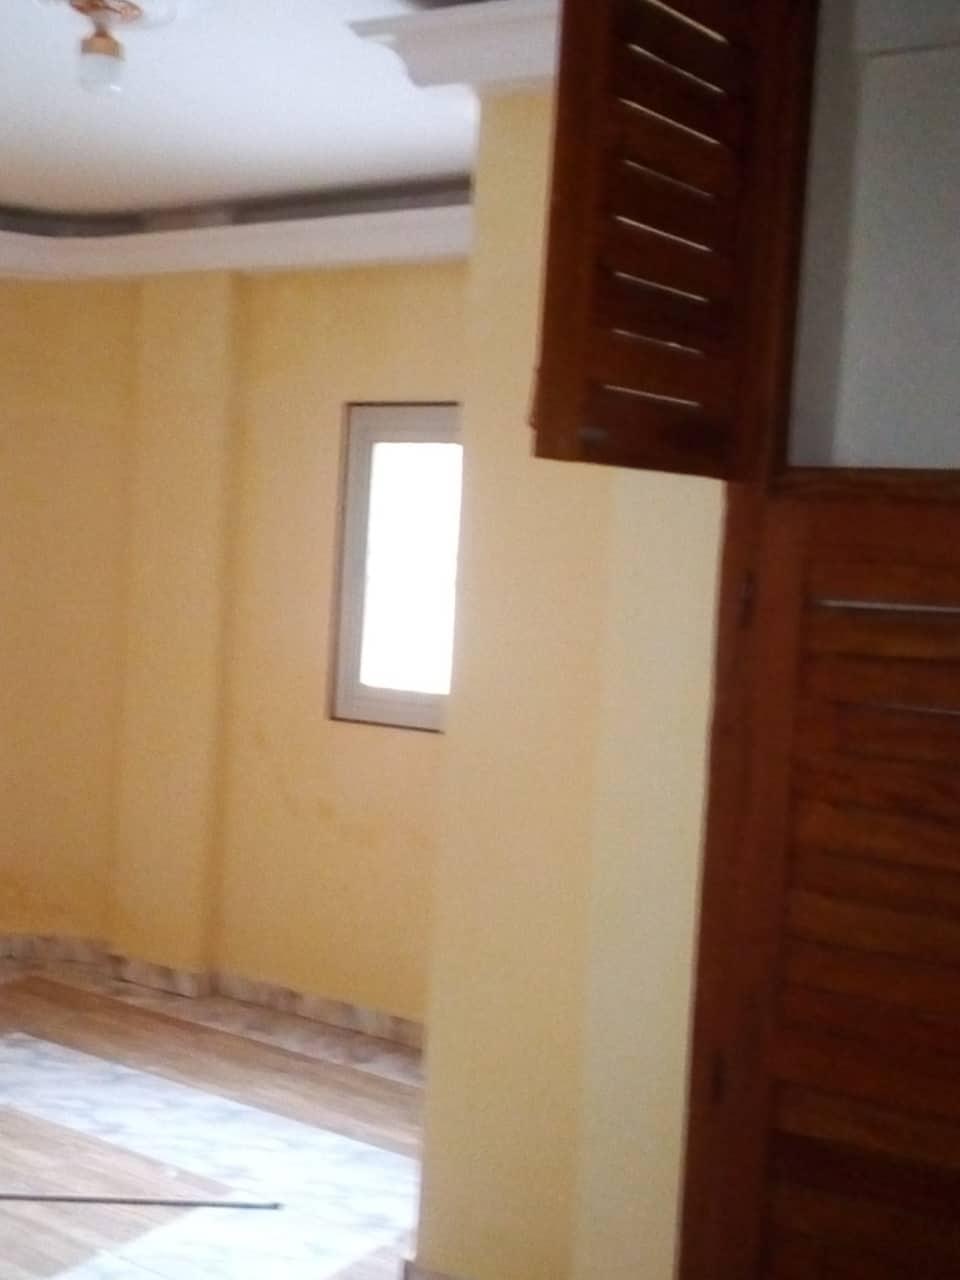 Shop to rent at Yaoundé, Bastos, pas de lambassade despagne - 200 m2 - 500 000 FCFA